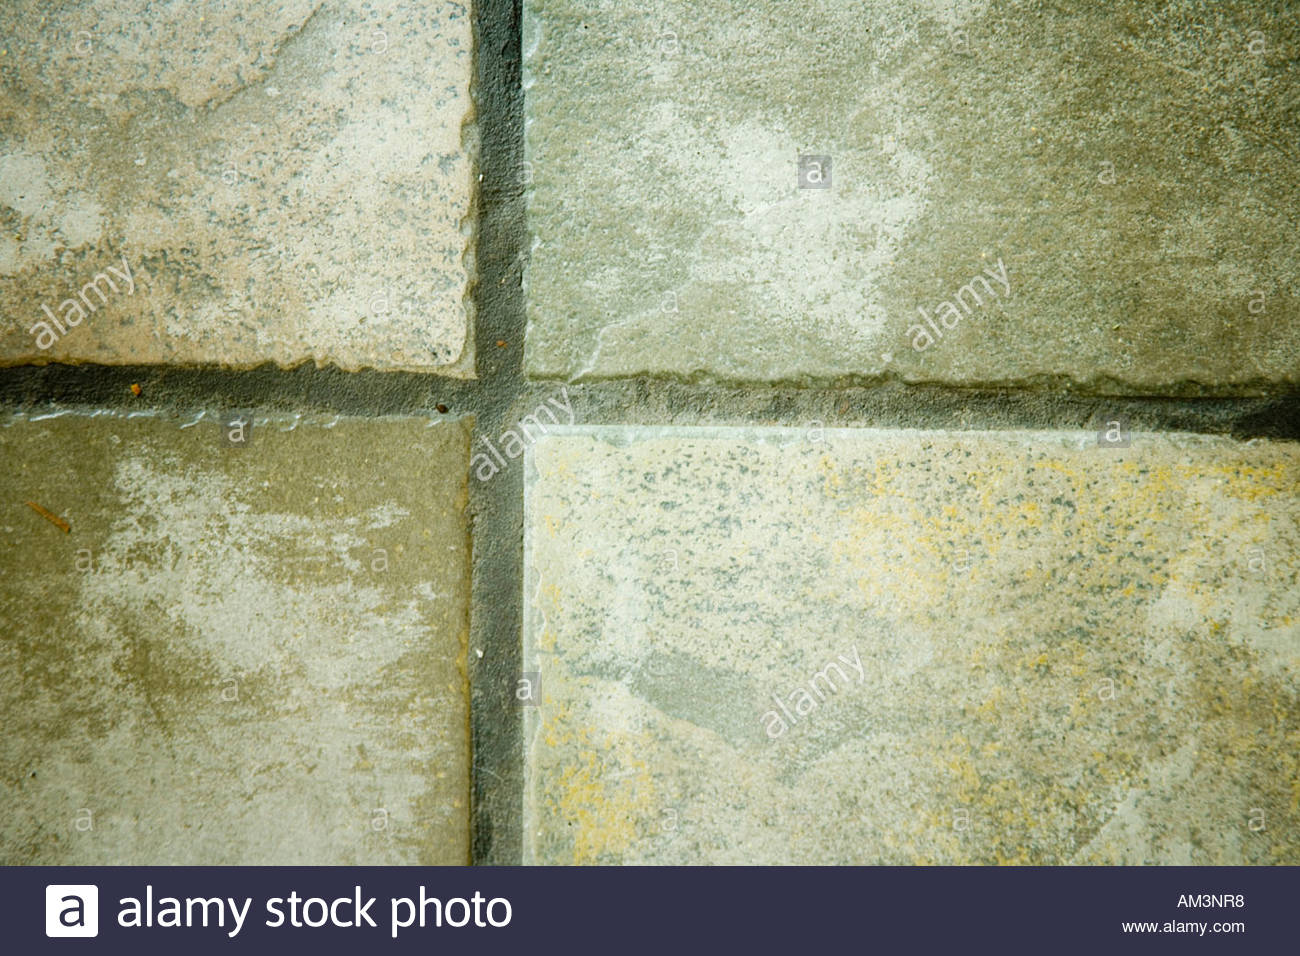 Intersection of rustic ceramic floor tiles with dark grey grout intersection of rustic ceramic floor tiles with dark grey grout dailygadgetfo Choice Image